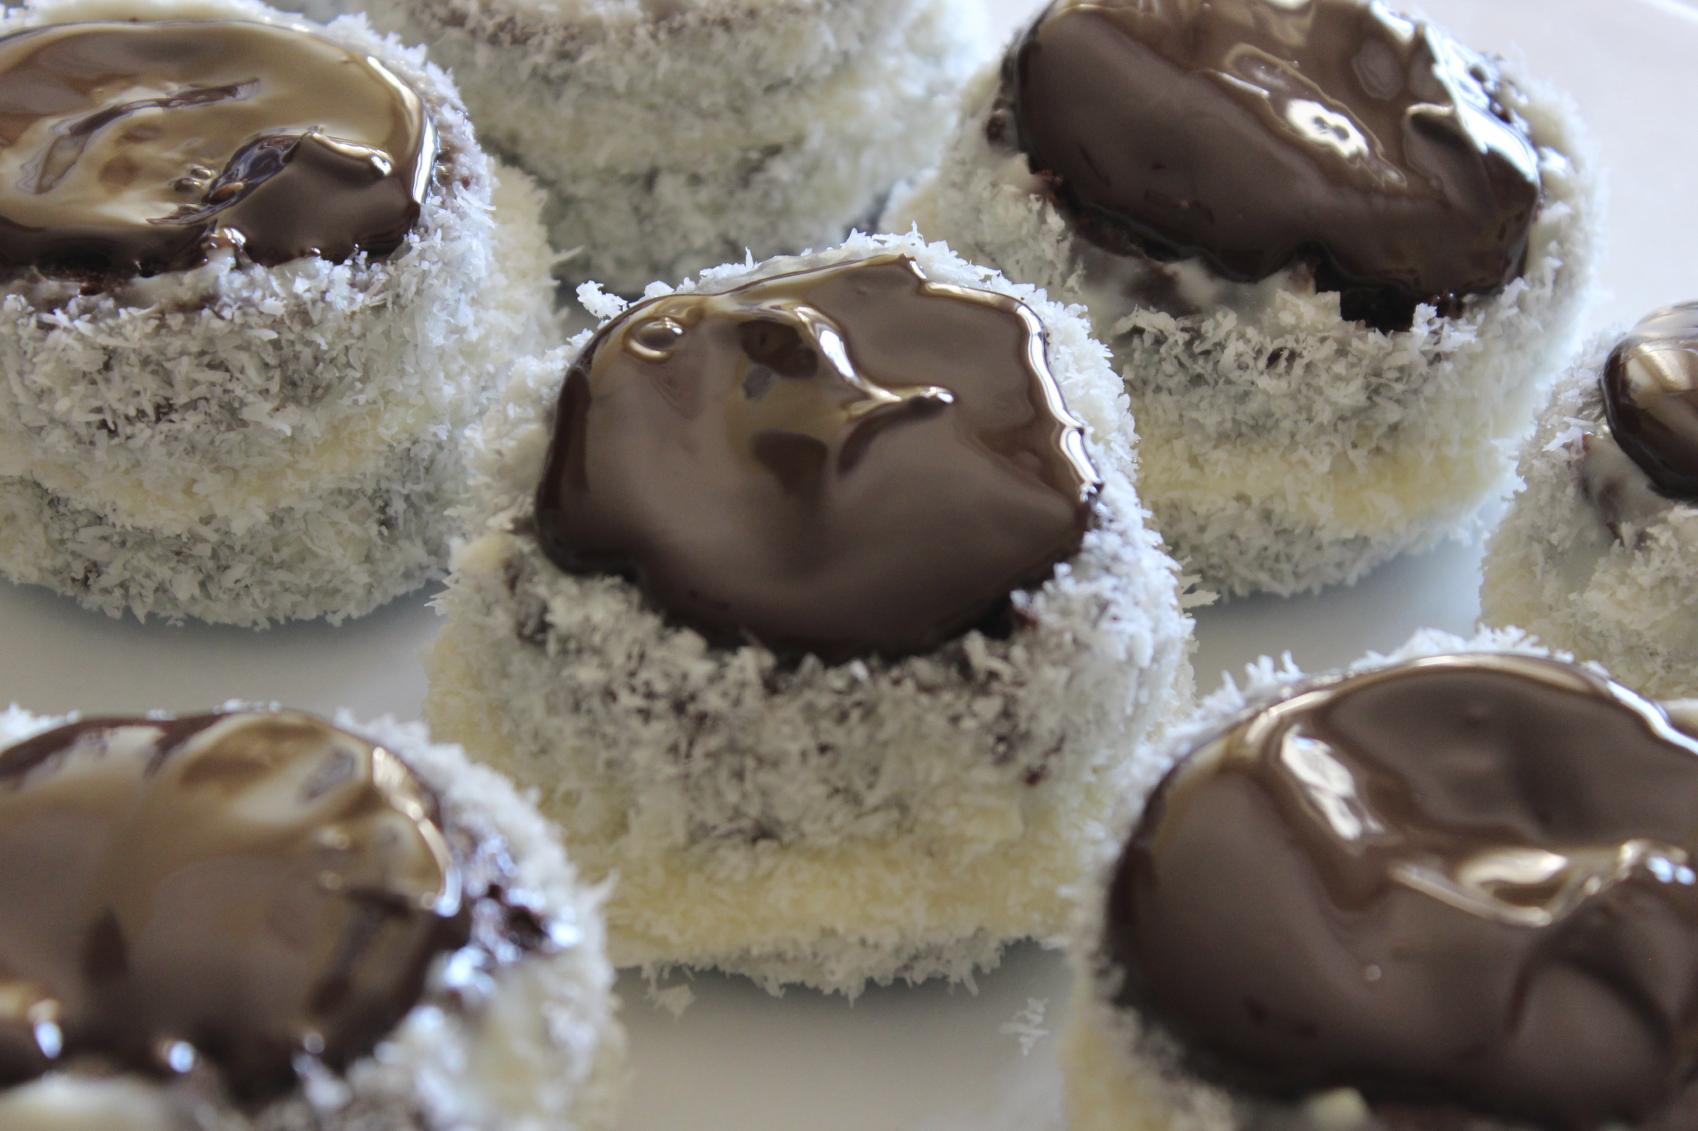 Recipe of coconut and chocolate pastries Riċetta: Pastini tal-coconuts u ċikkulata